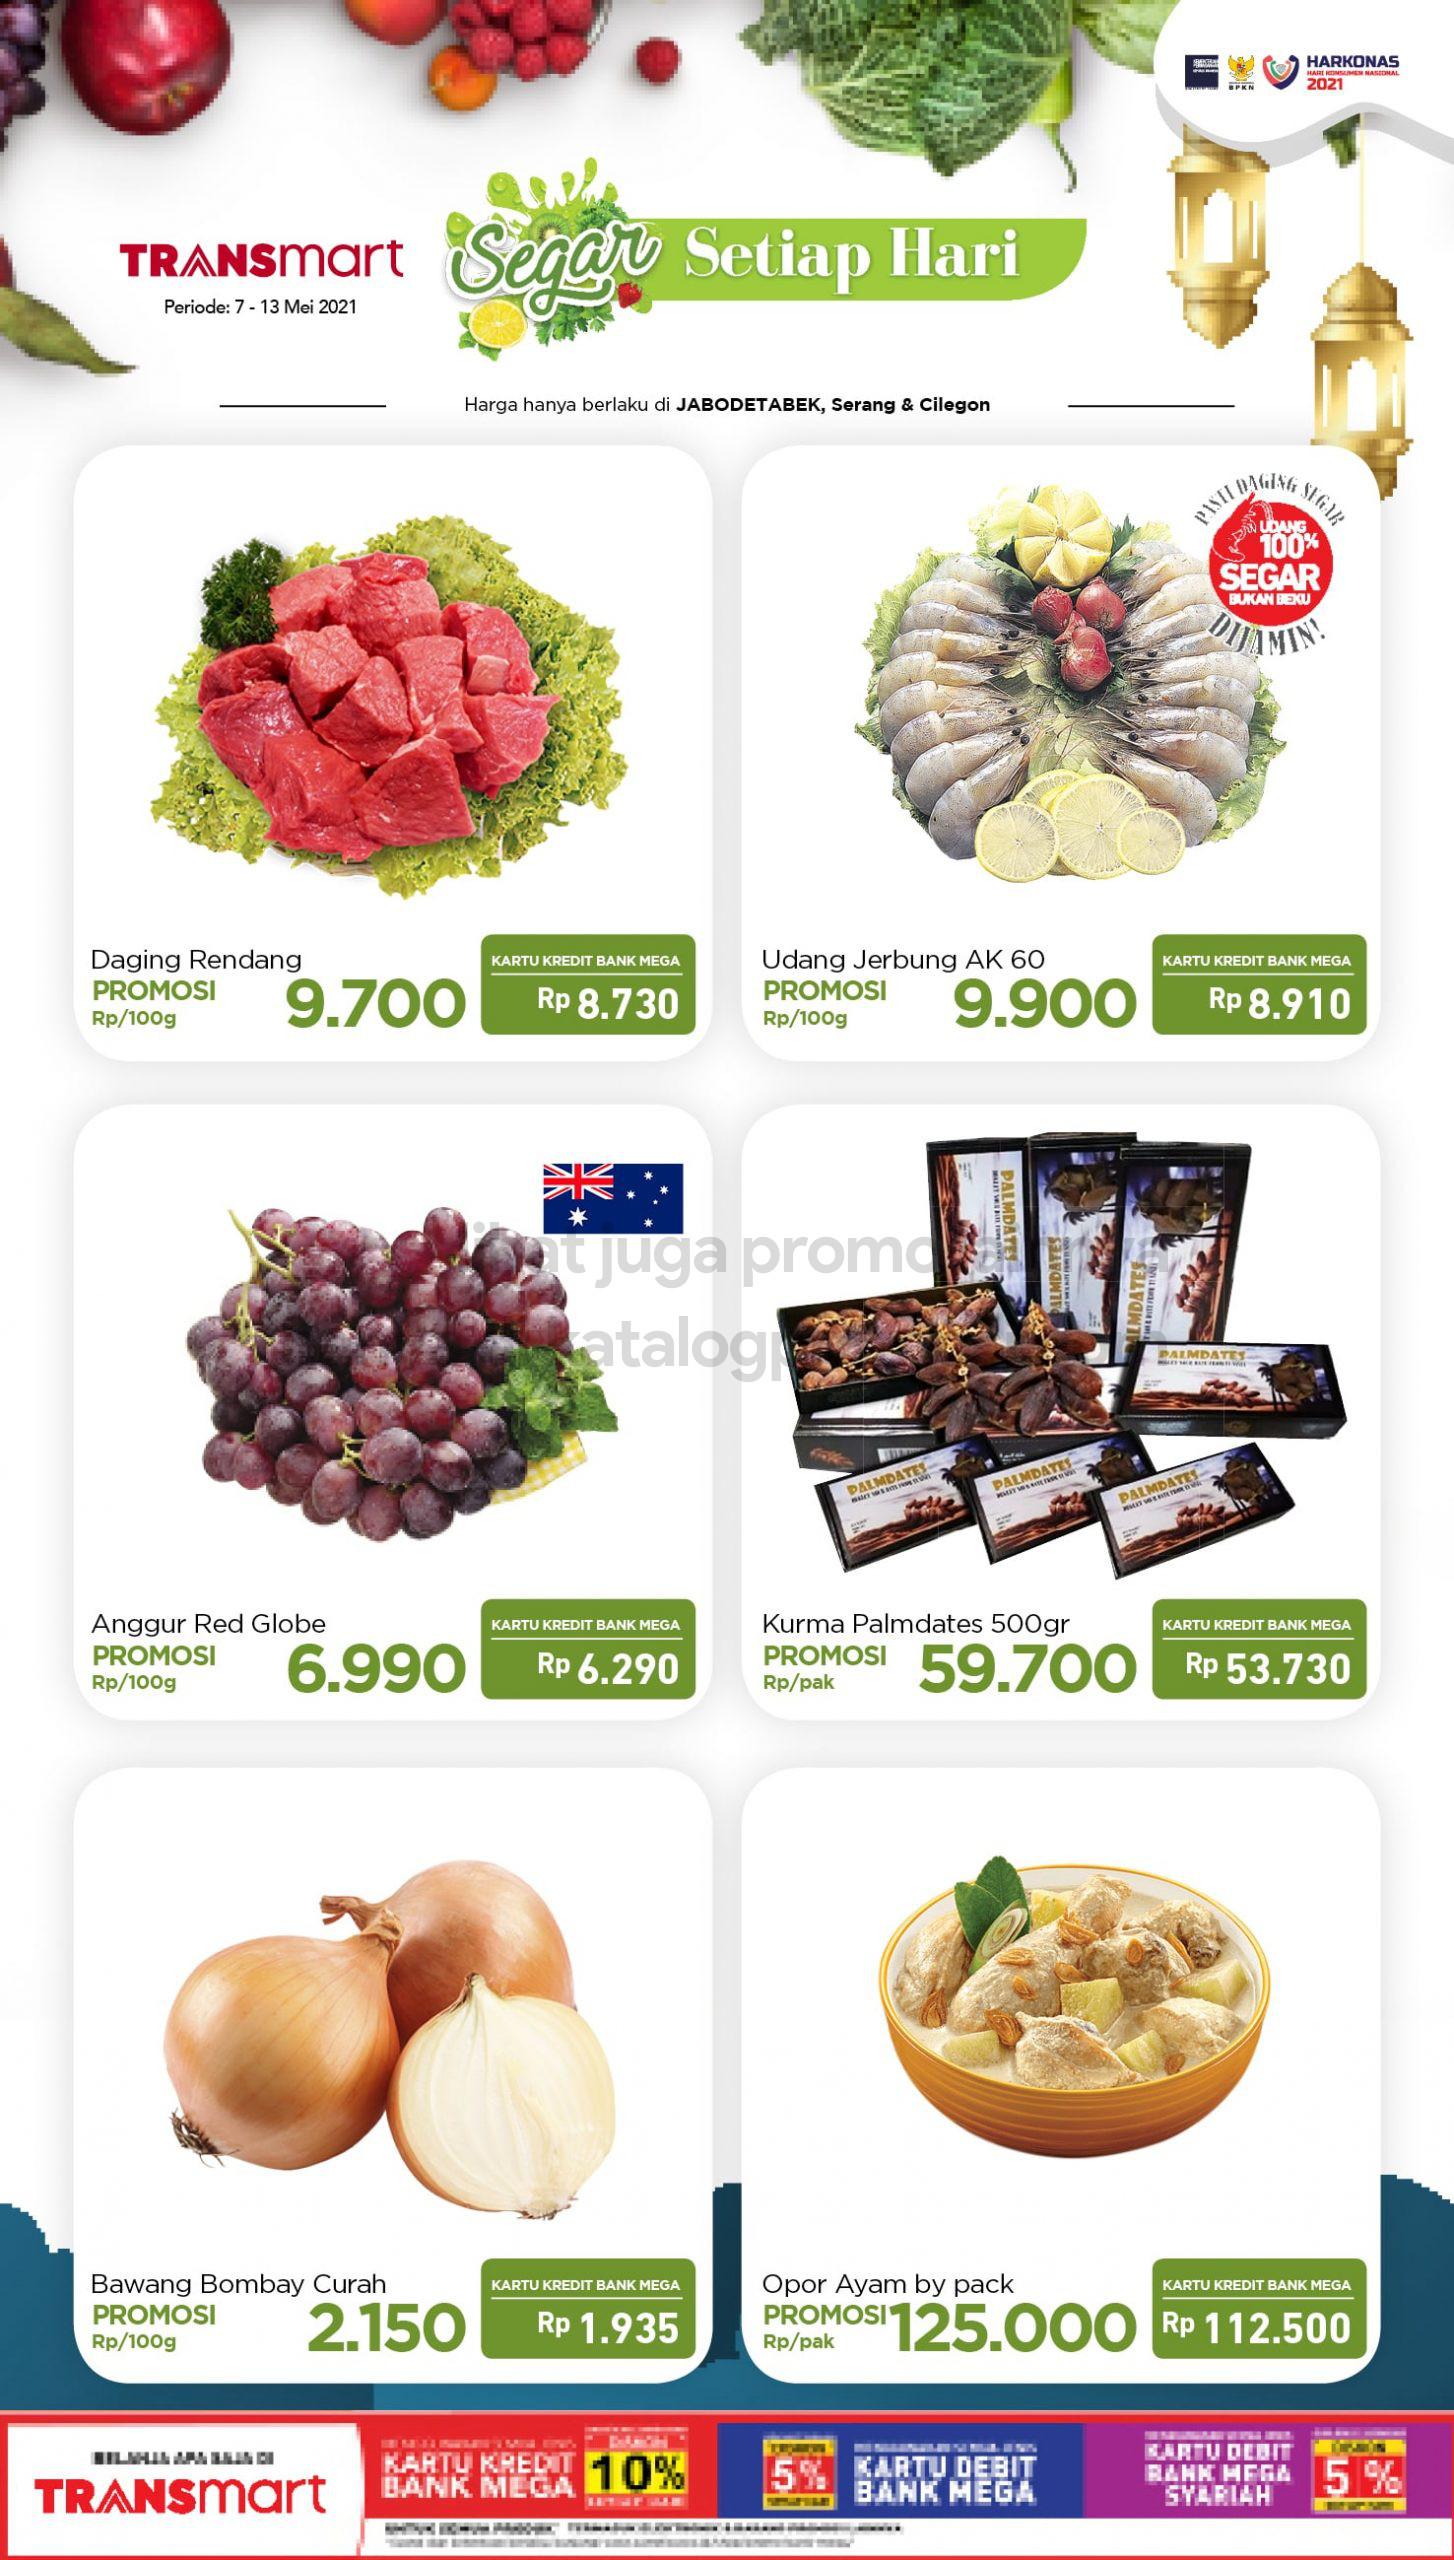 Promo TRANSMART CARREFOUR Katalog Promo HEMAT Produk FRESH periode 07-13 Mei 2021